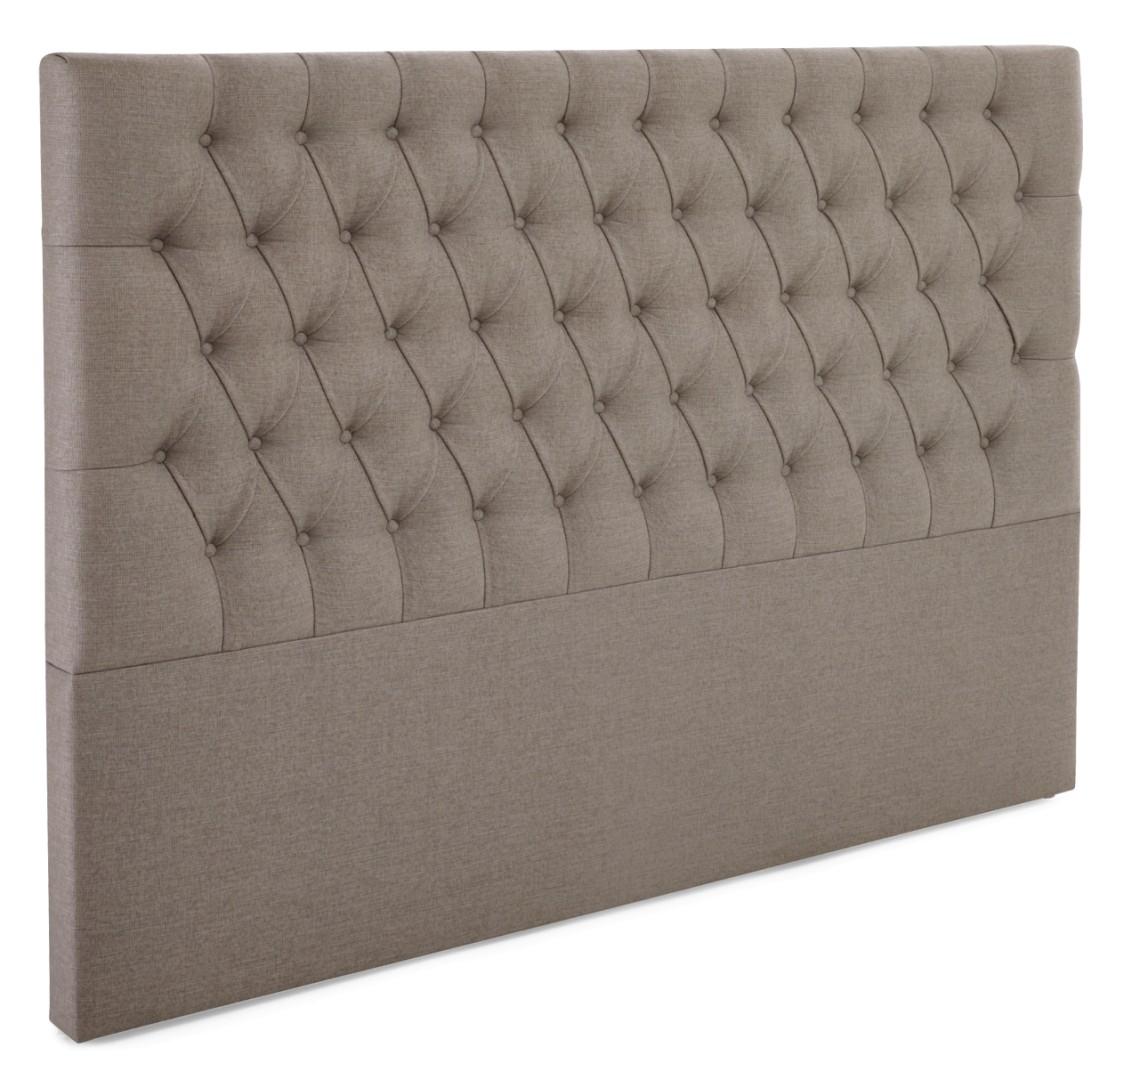 ELISE-sängynpääty 180 cm